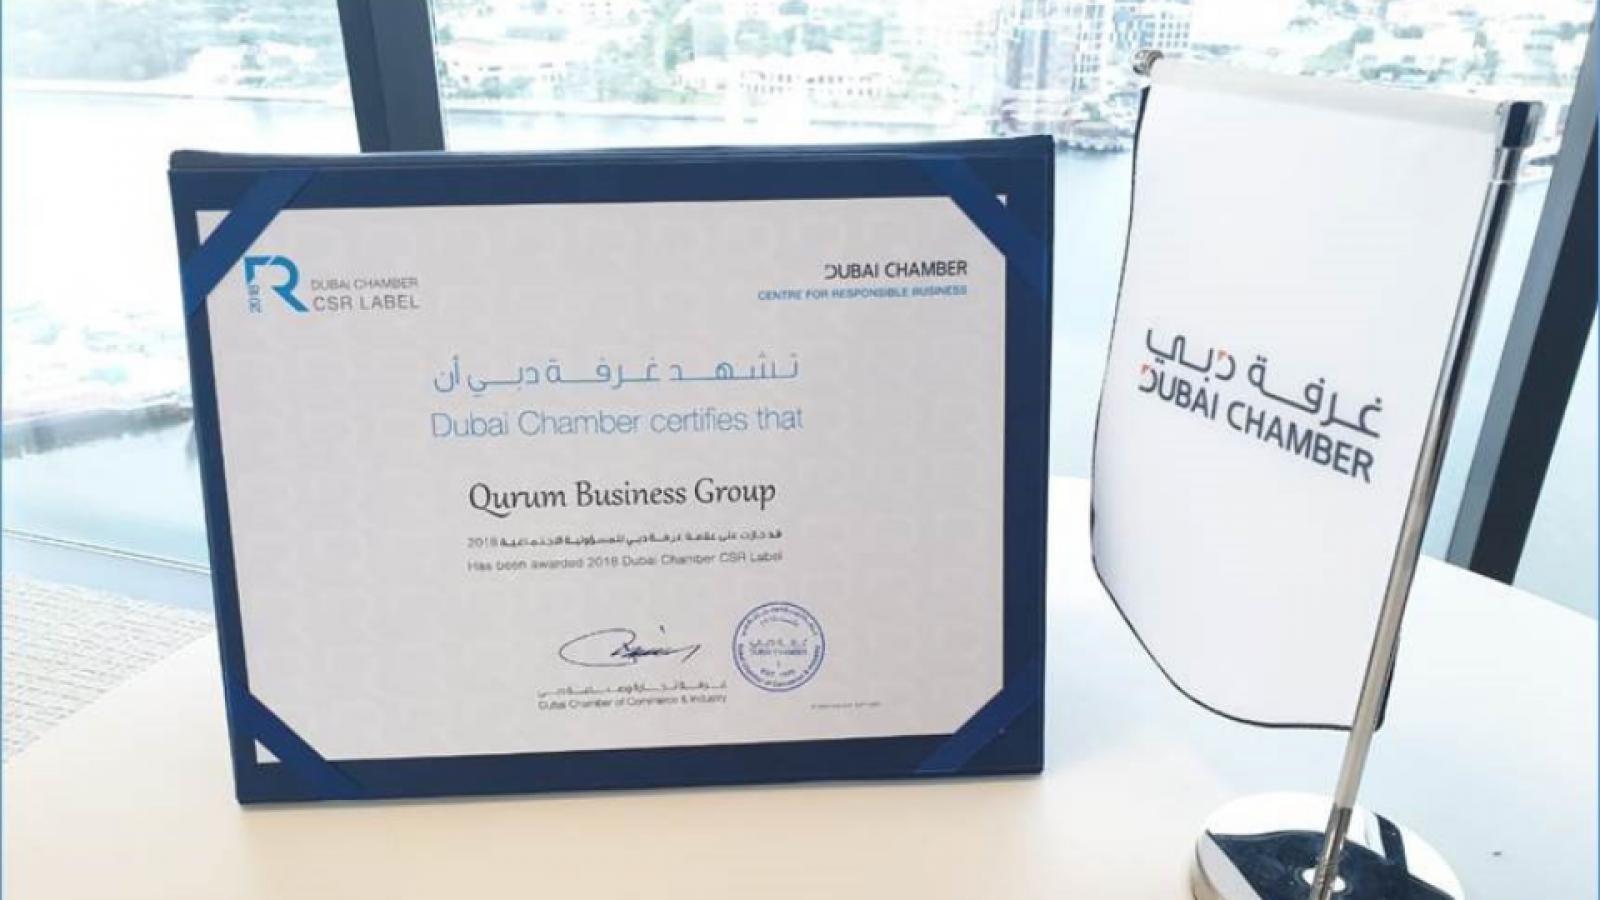 CSR Label Award 2018